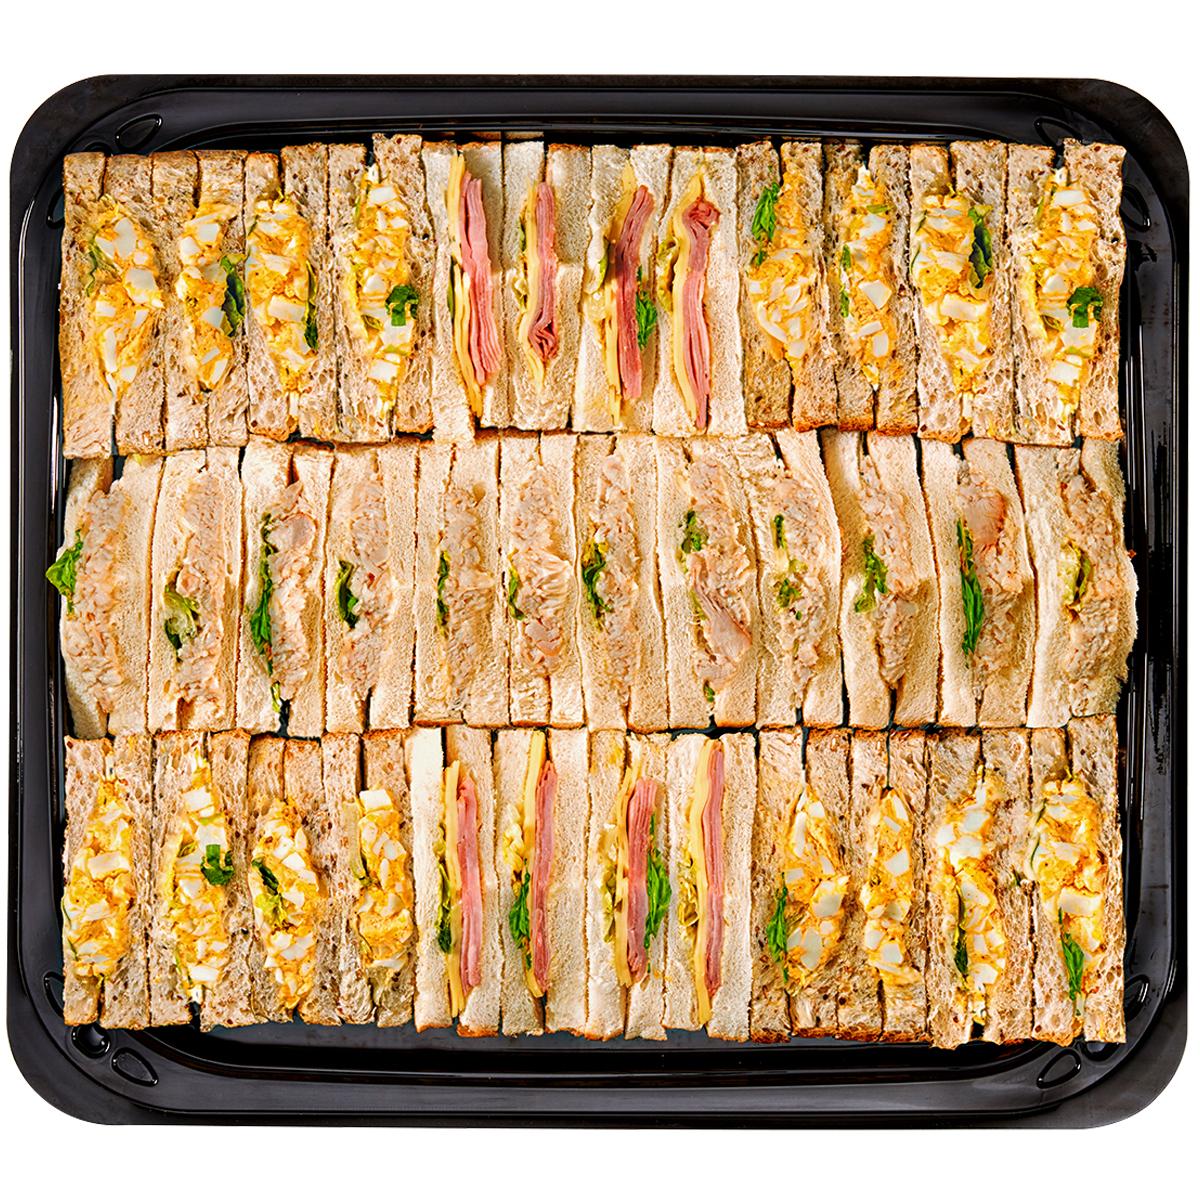 Sandwich Platter Costco Australia